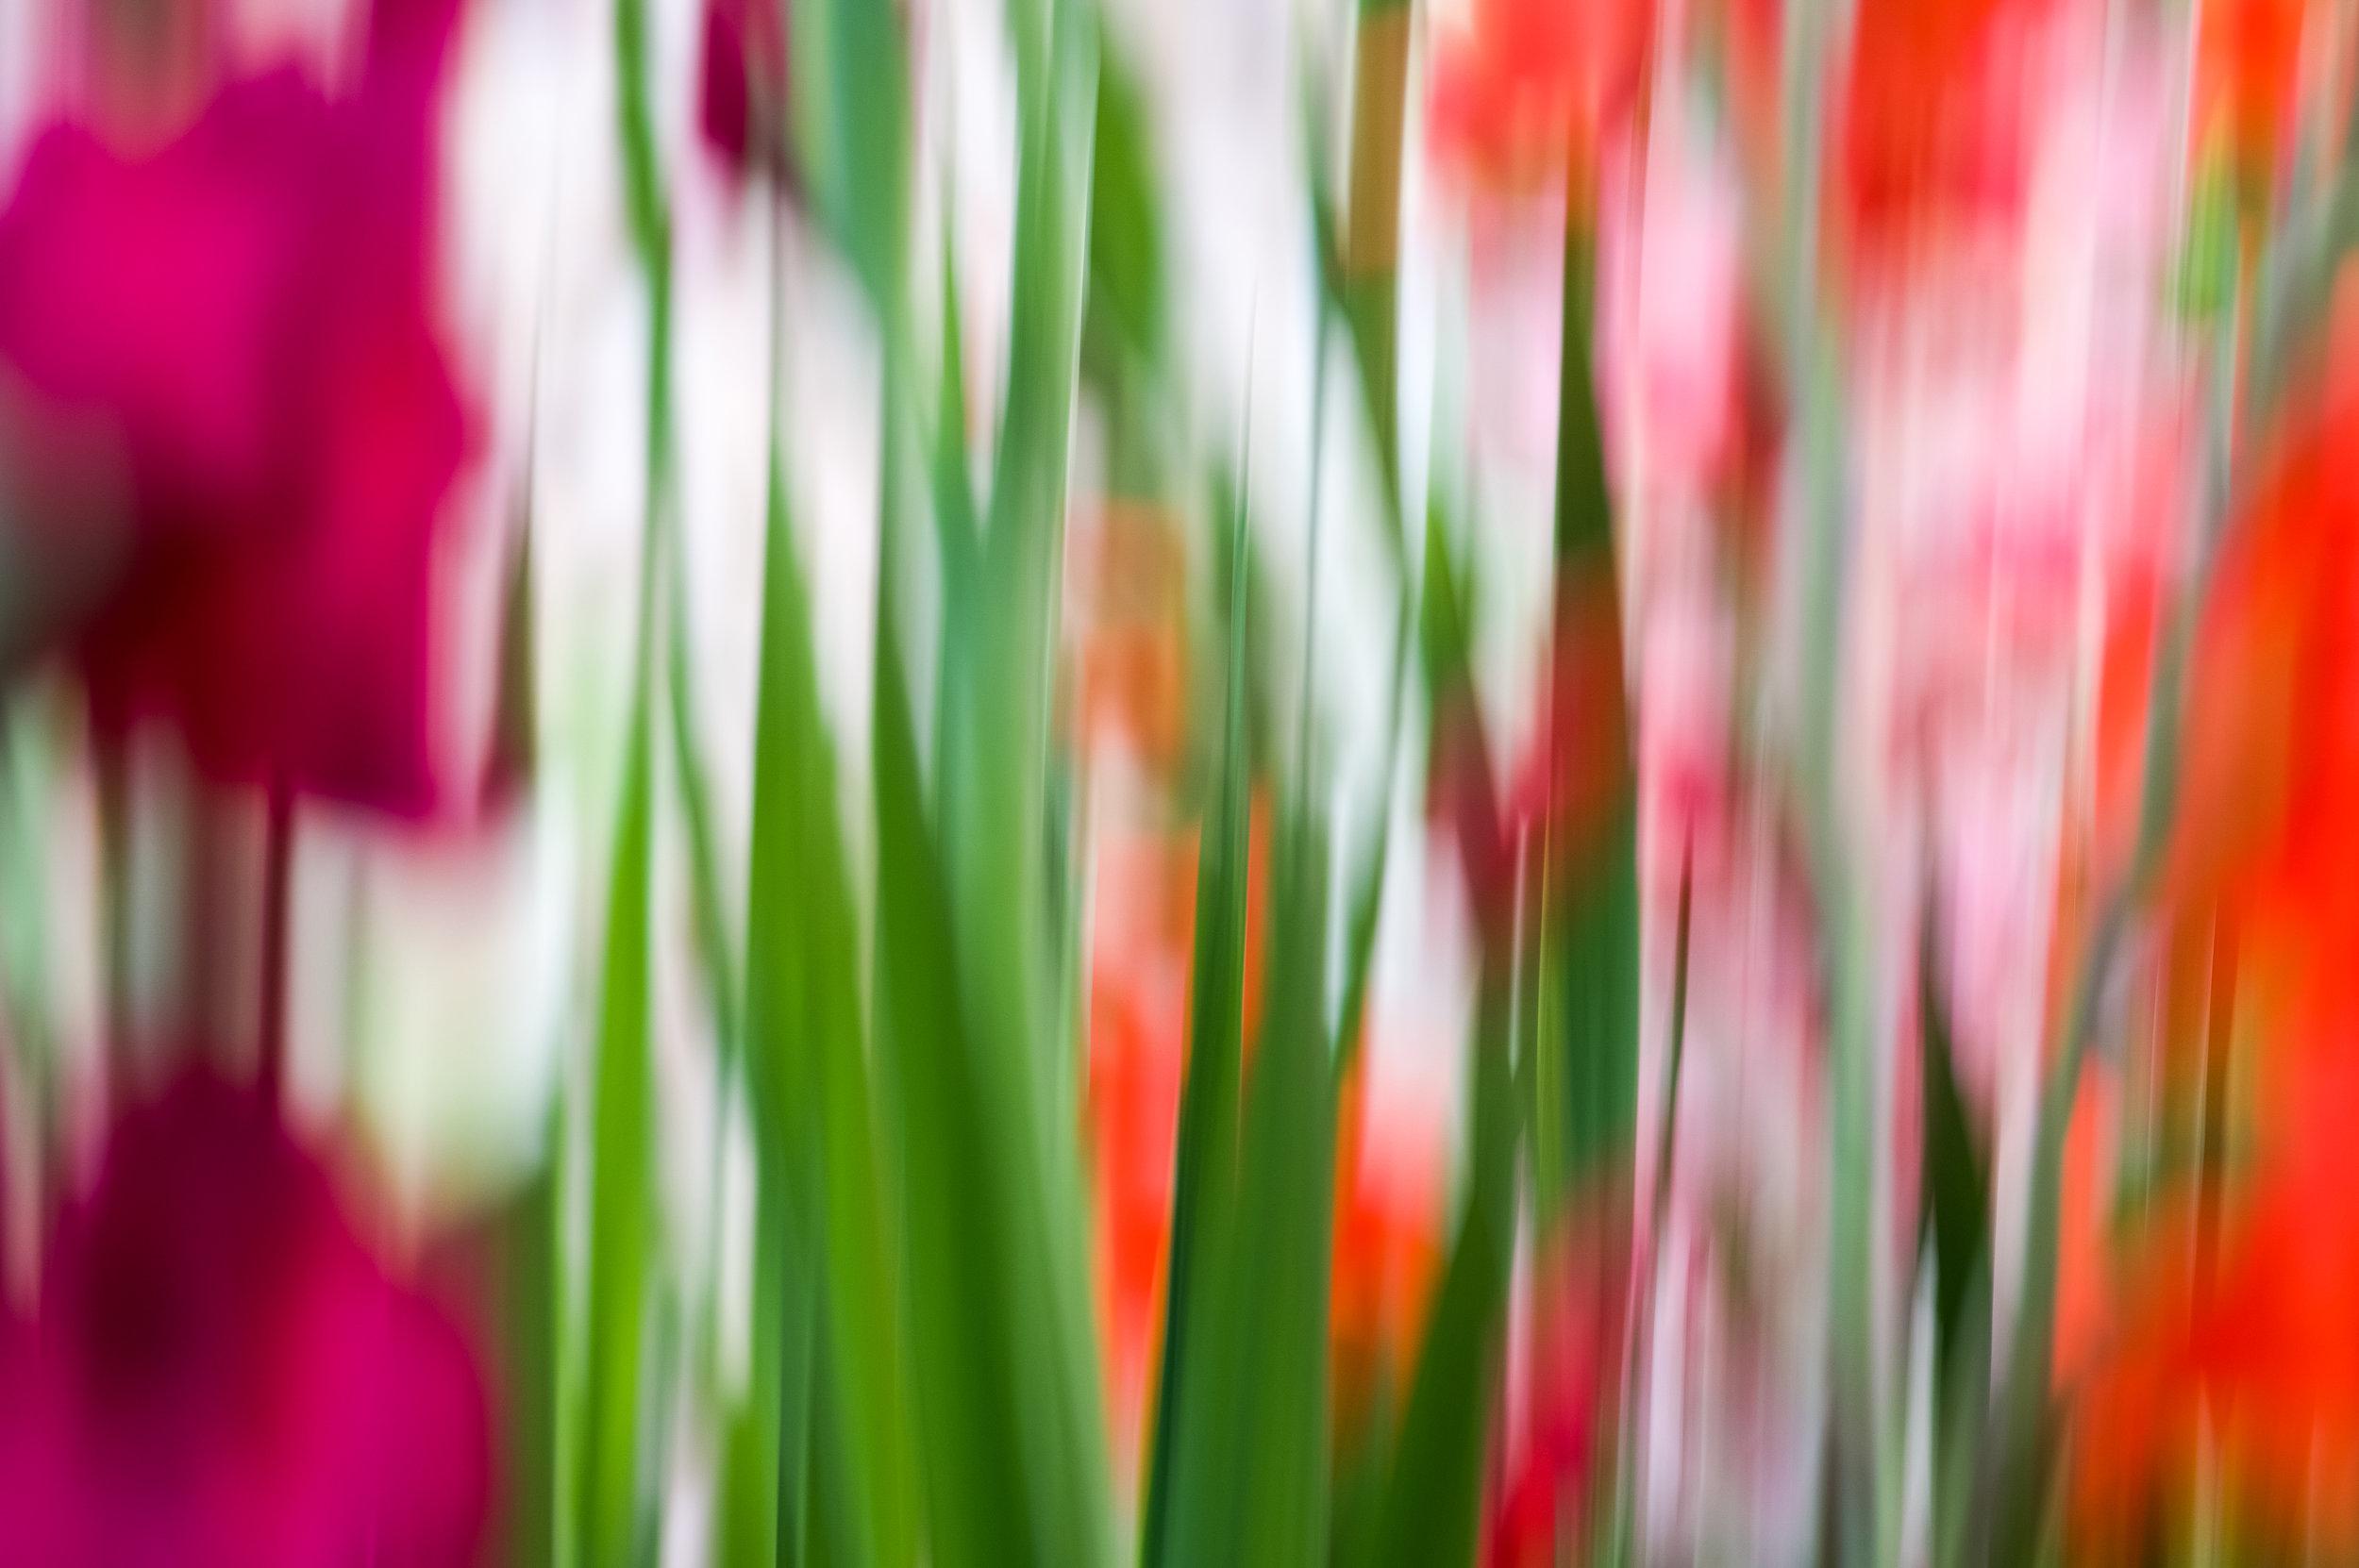 colors_weston_garden.jpg